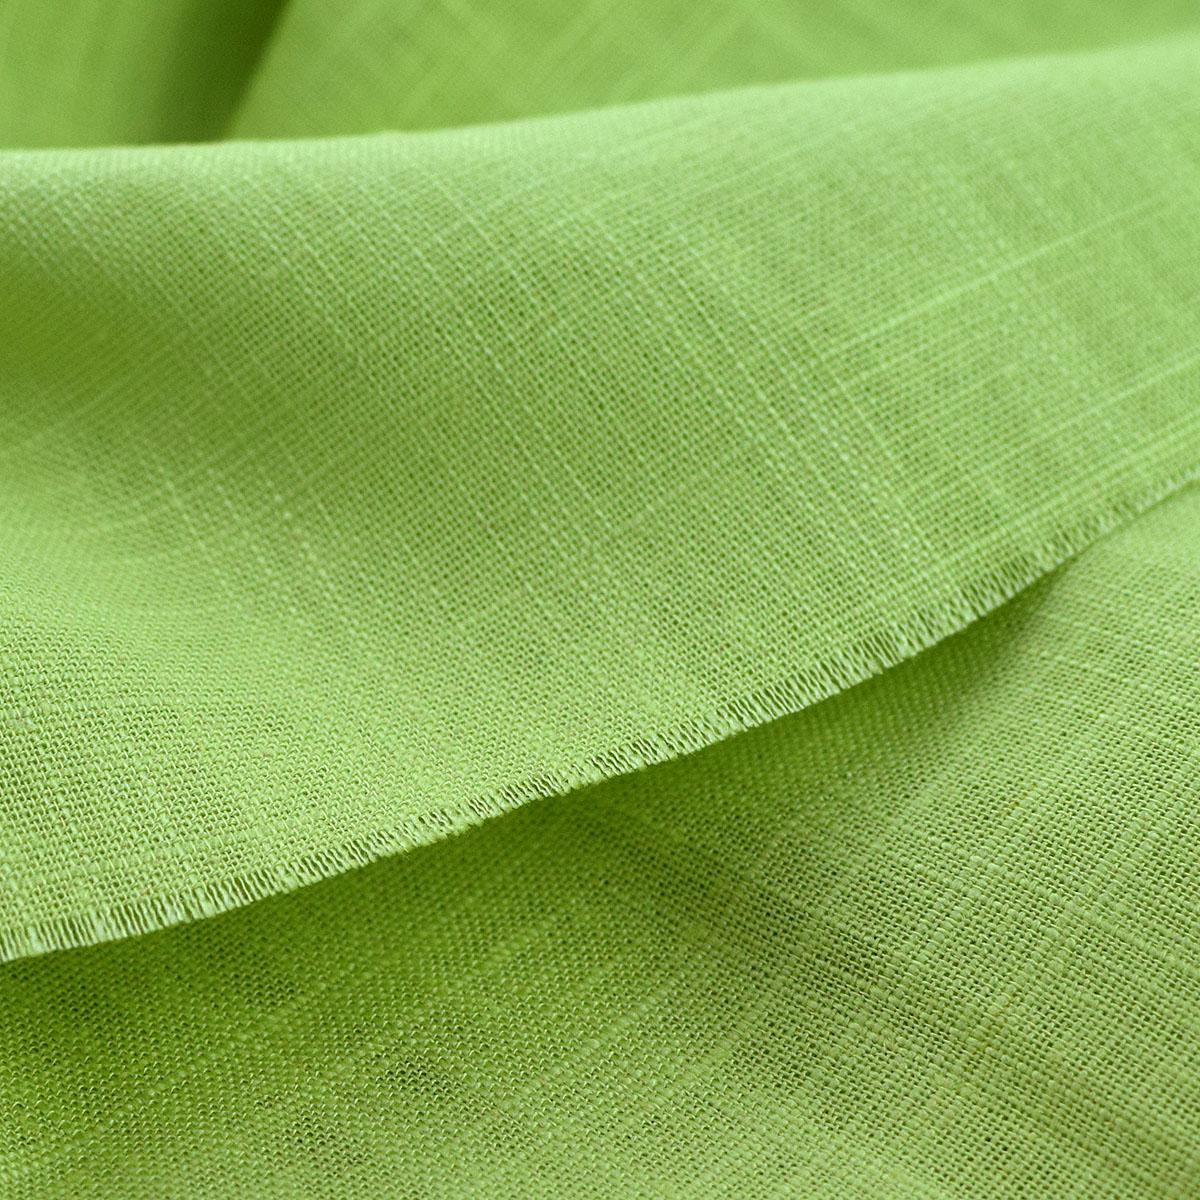 Plain summer high quality slub linen solid linen cotton linen clothing Dress Shorts fabric